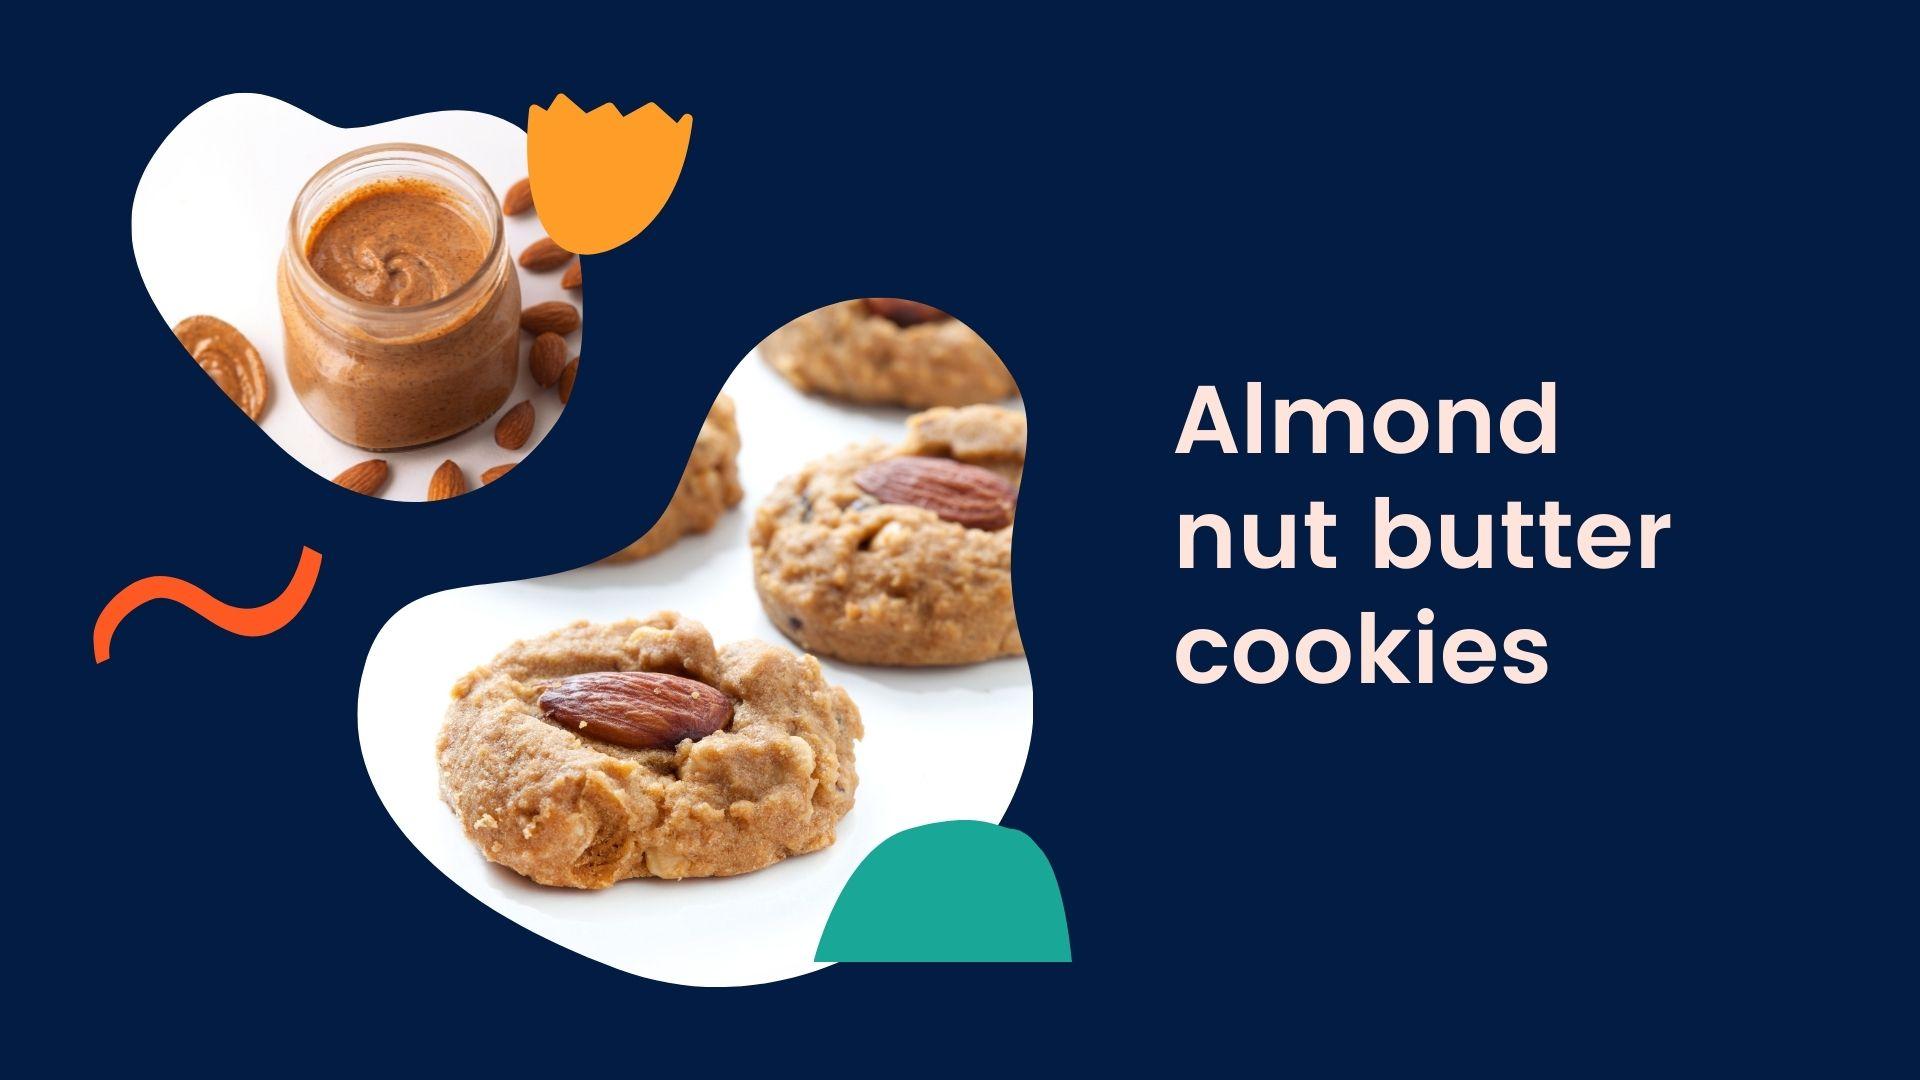 almond nut butter cookies